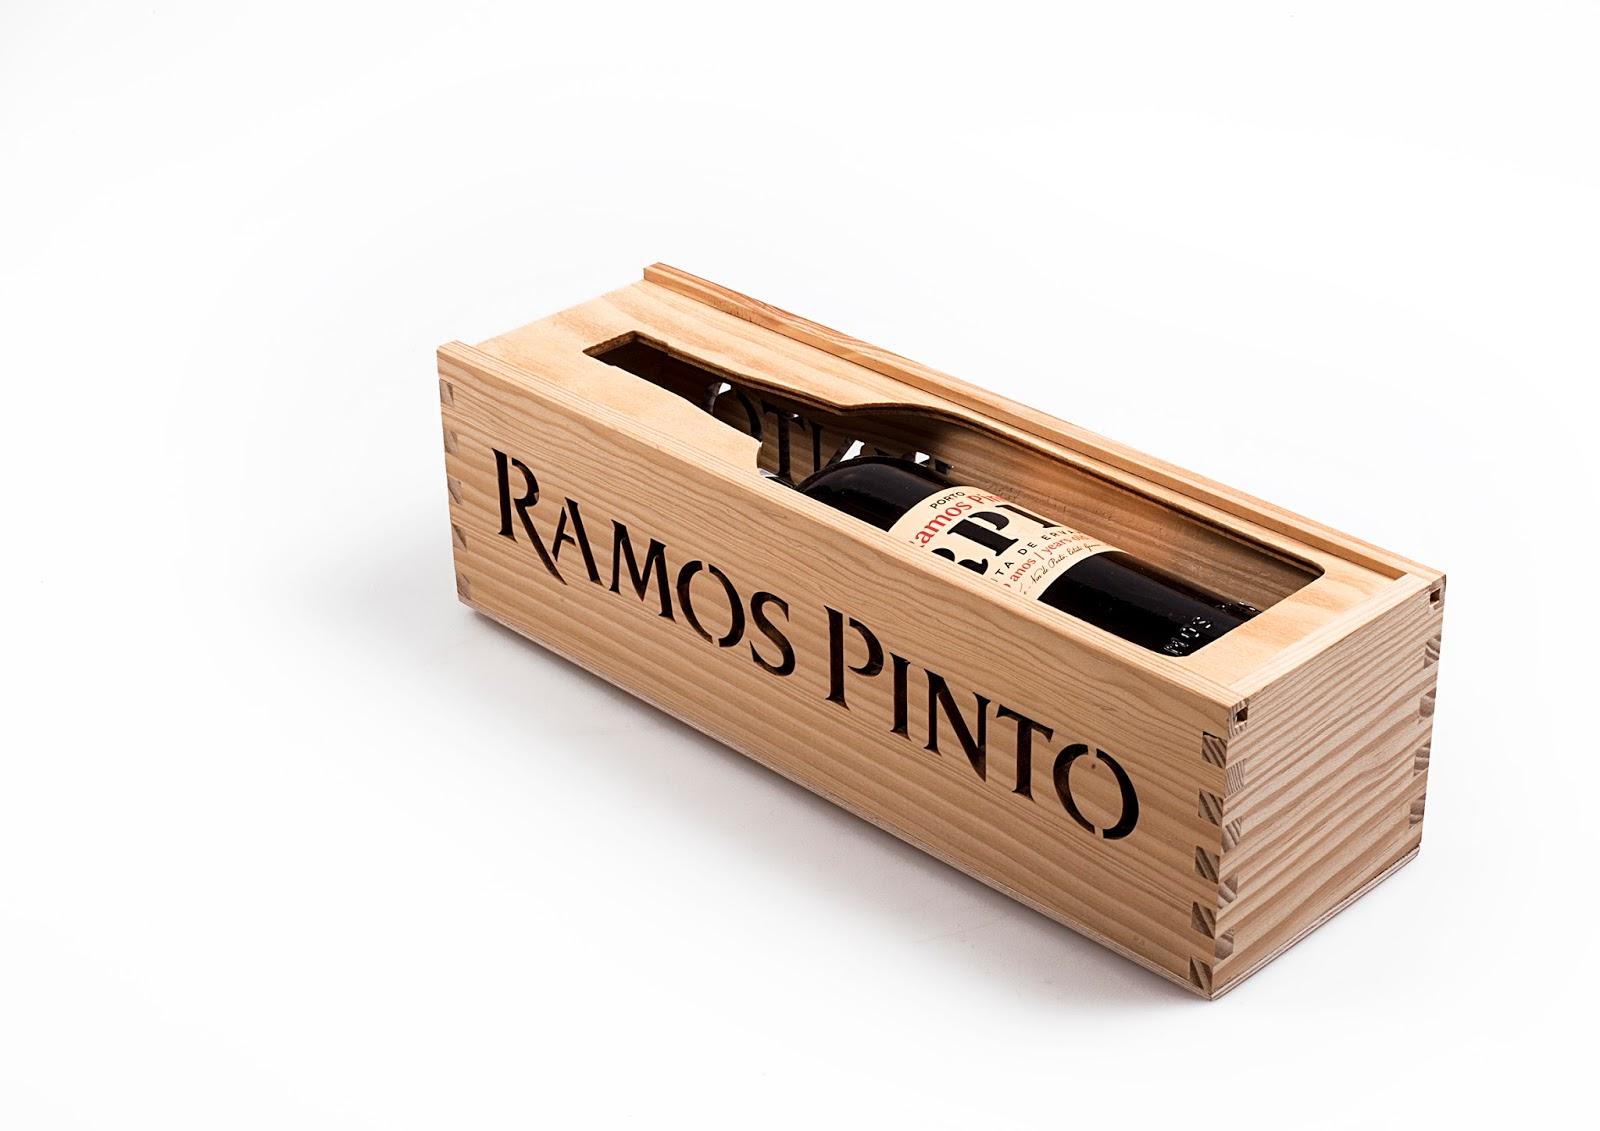 Creative Directors Sergio Correia Elias Marques Project Type Produced Commercial Work Client Ramos Pinto Location Porto Portugal